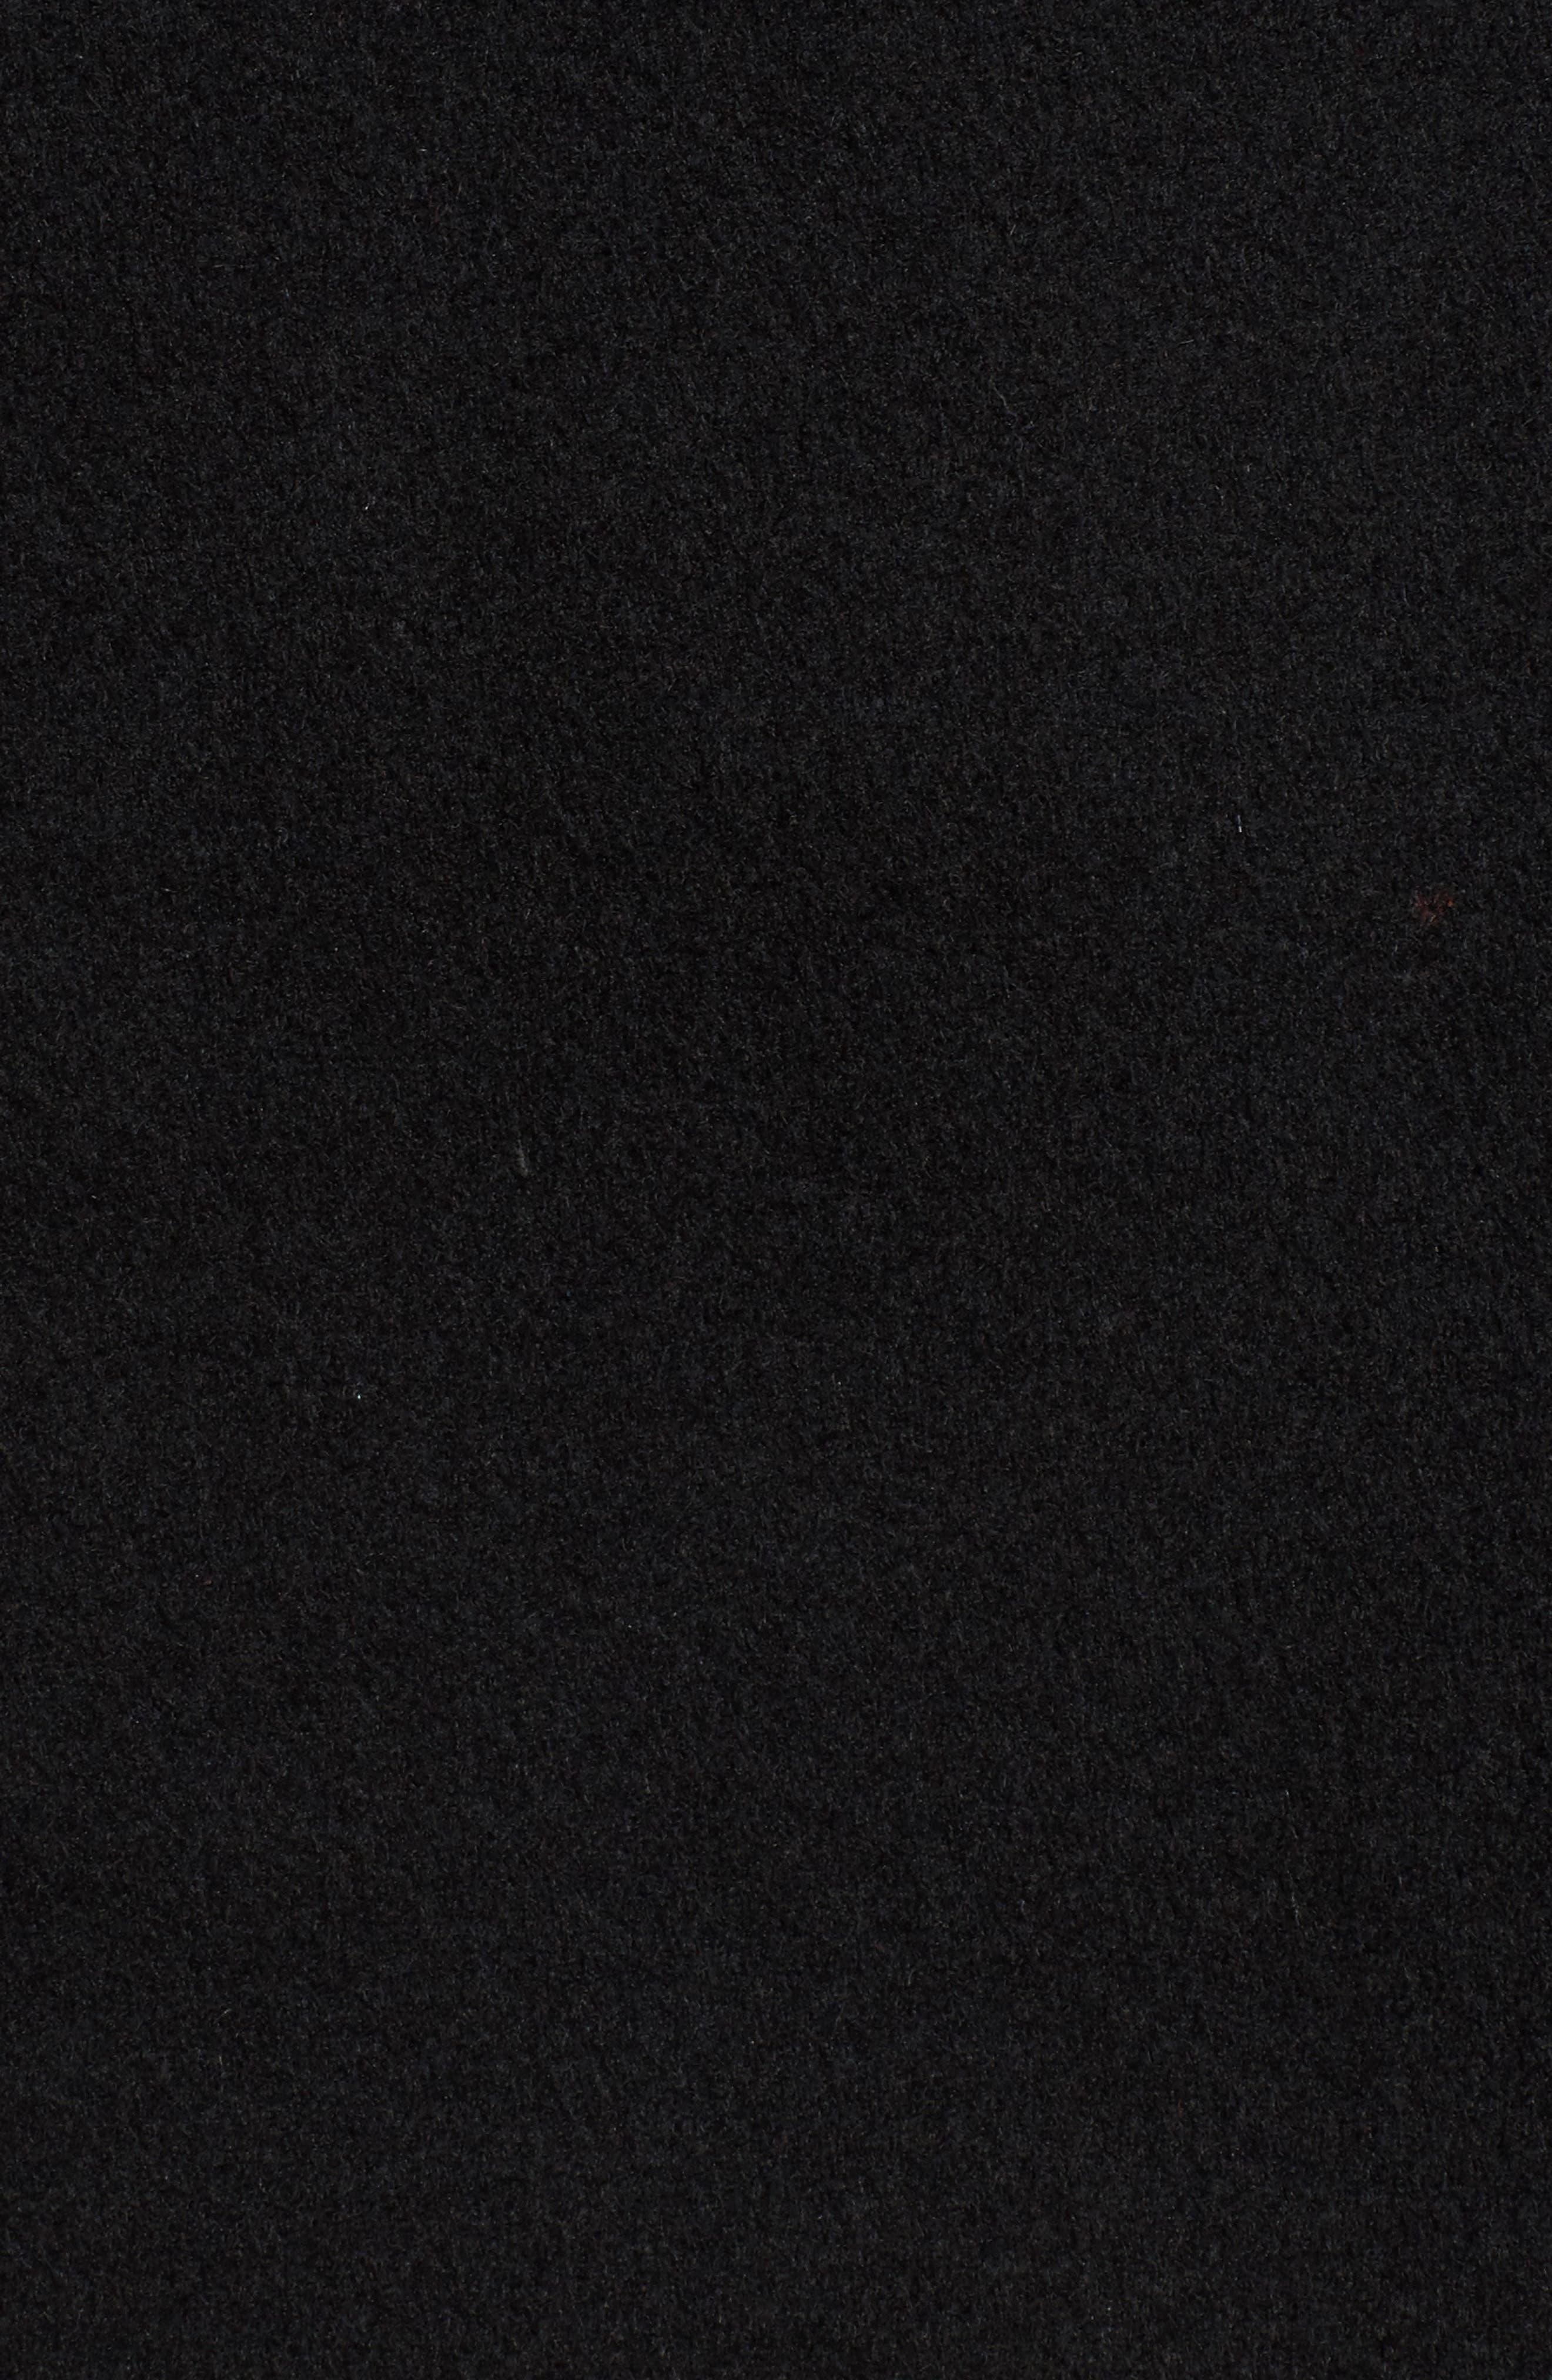 Wool Blend Coat,                             Alternate thumbnail 7, color,                             BLACK